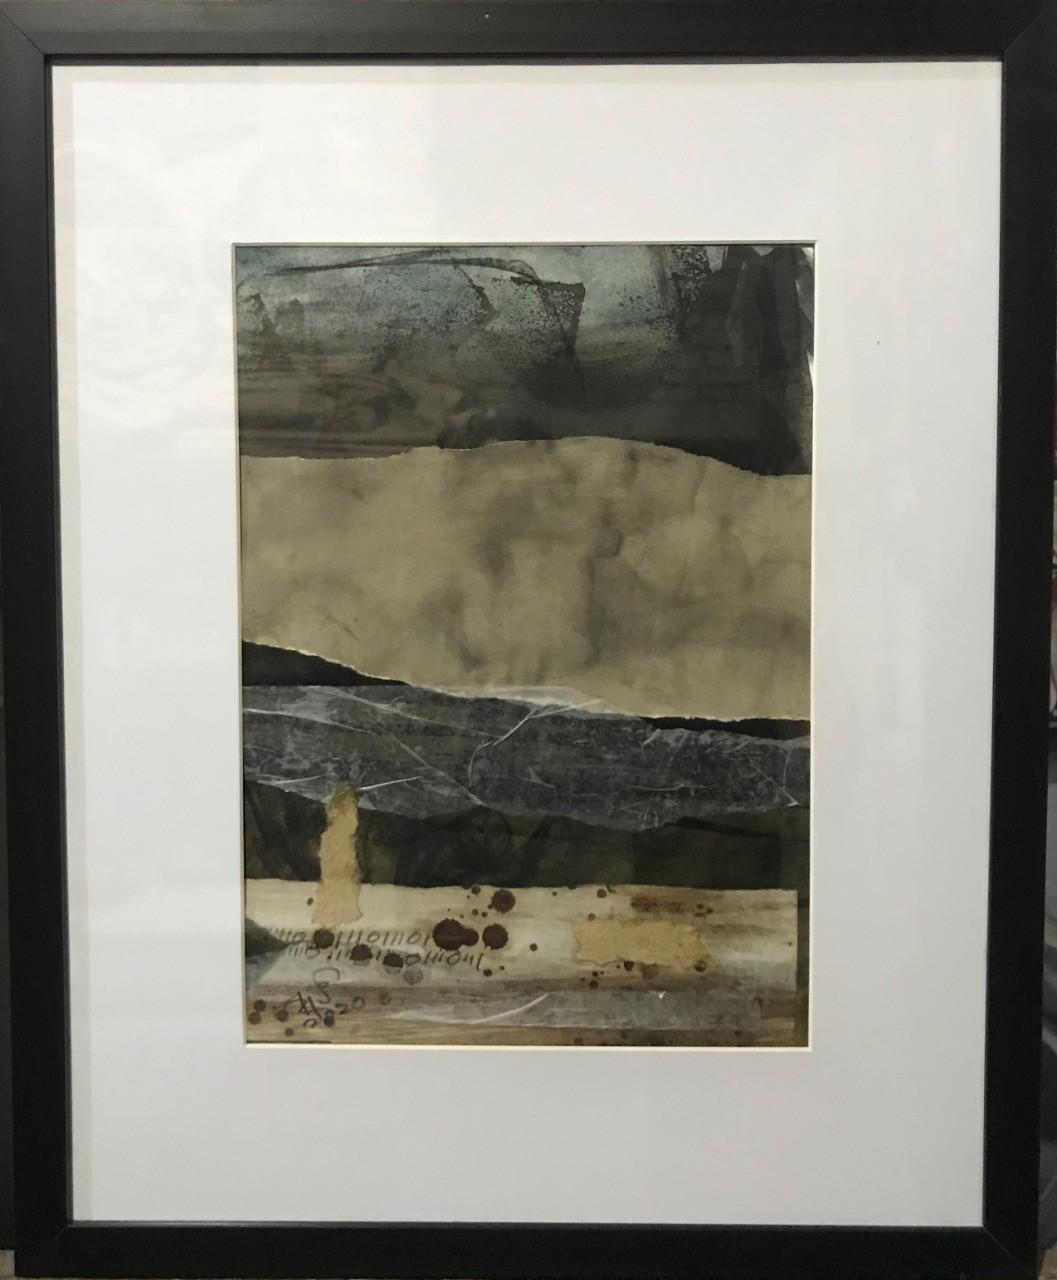 Abstract/Environment (22) by Ajith Susantha